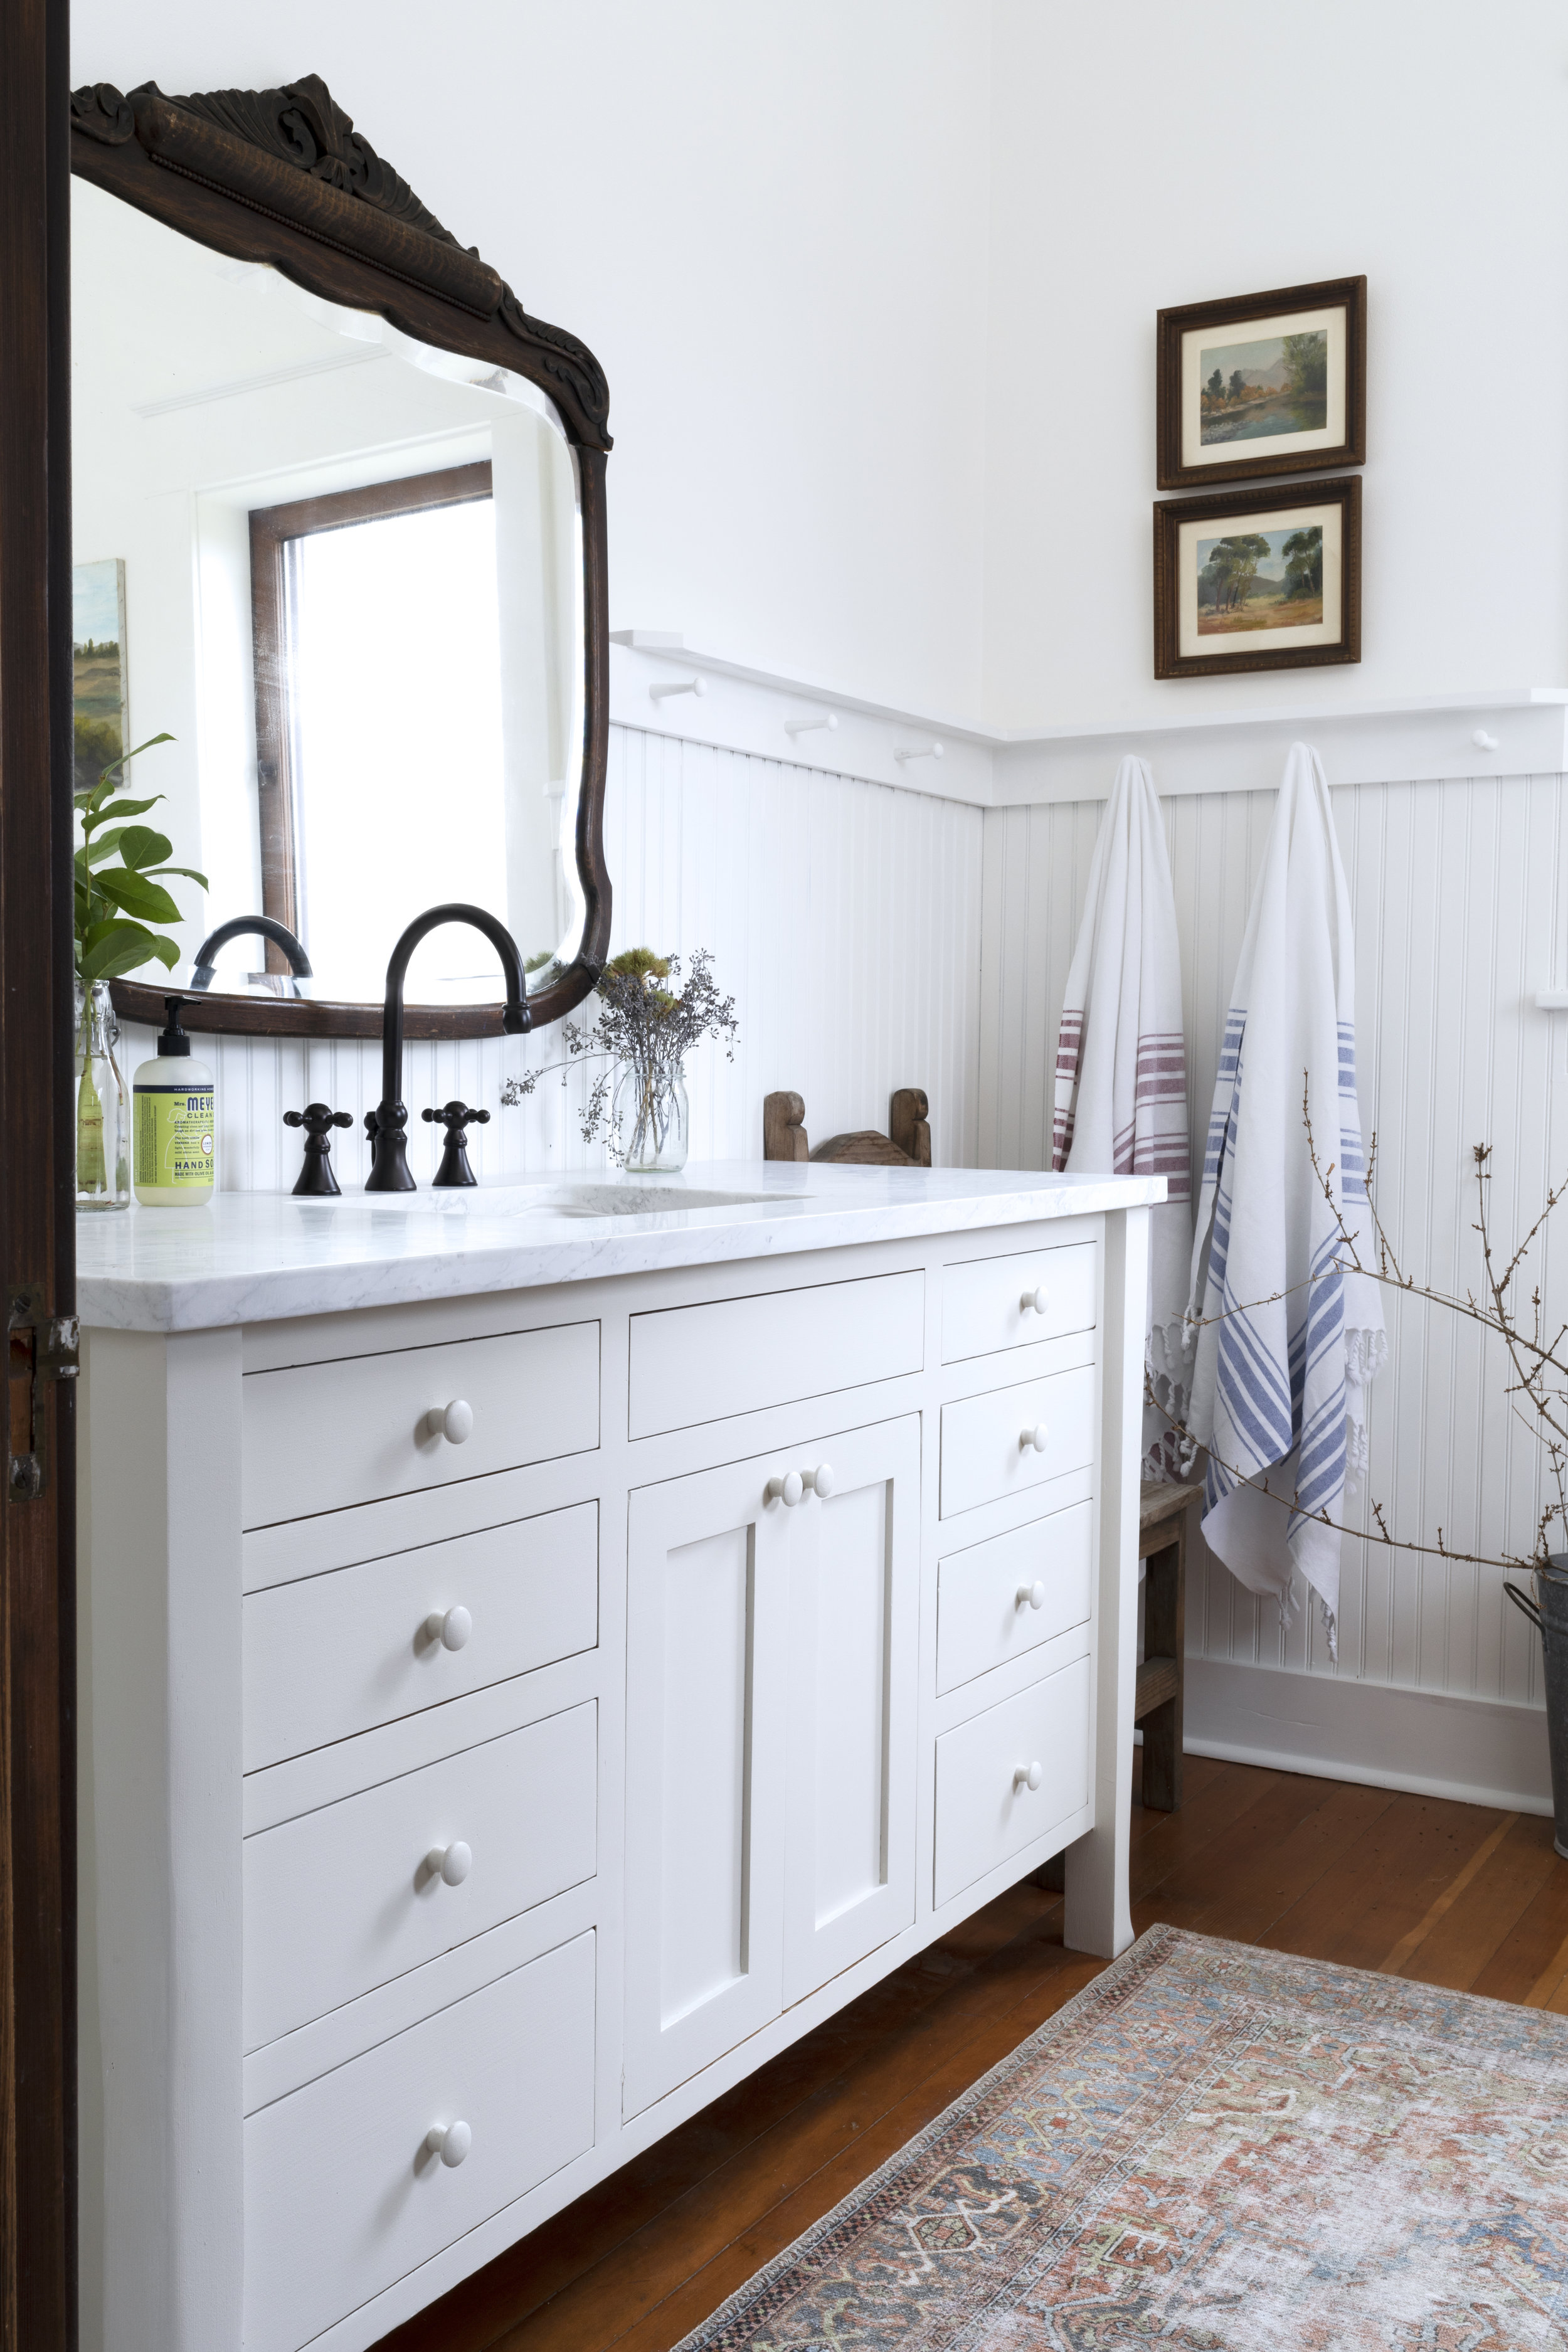 The Grit and Polish - Farmhouse Bathroom Budget Refresh Vanity AFTER.jpg